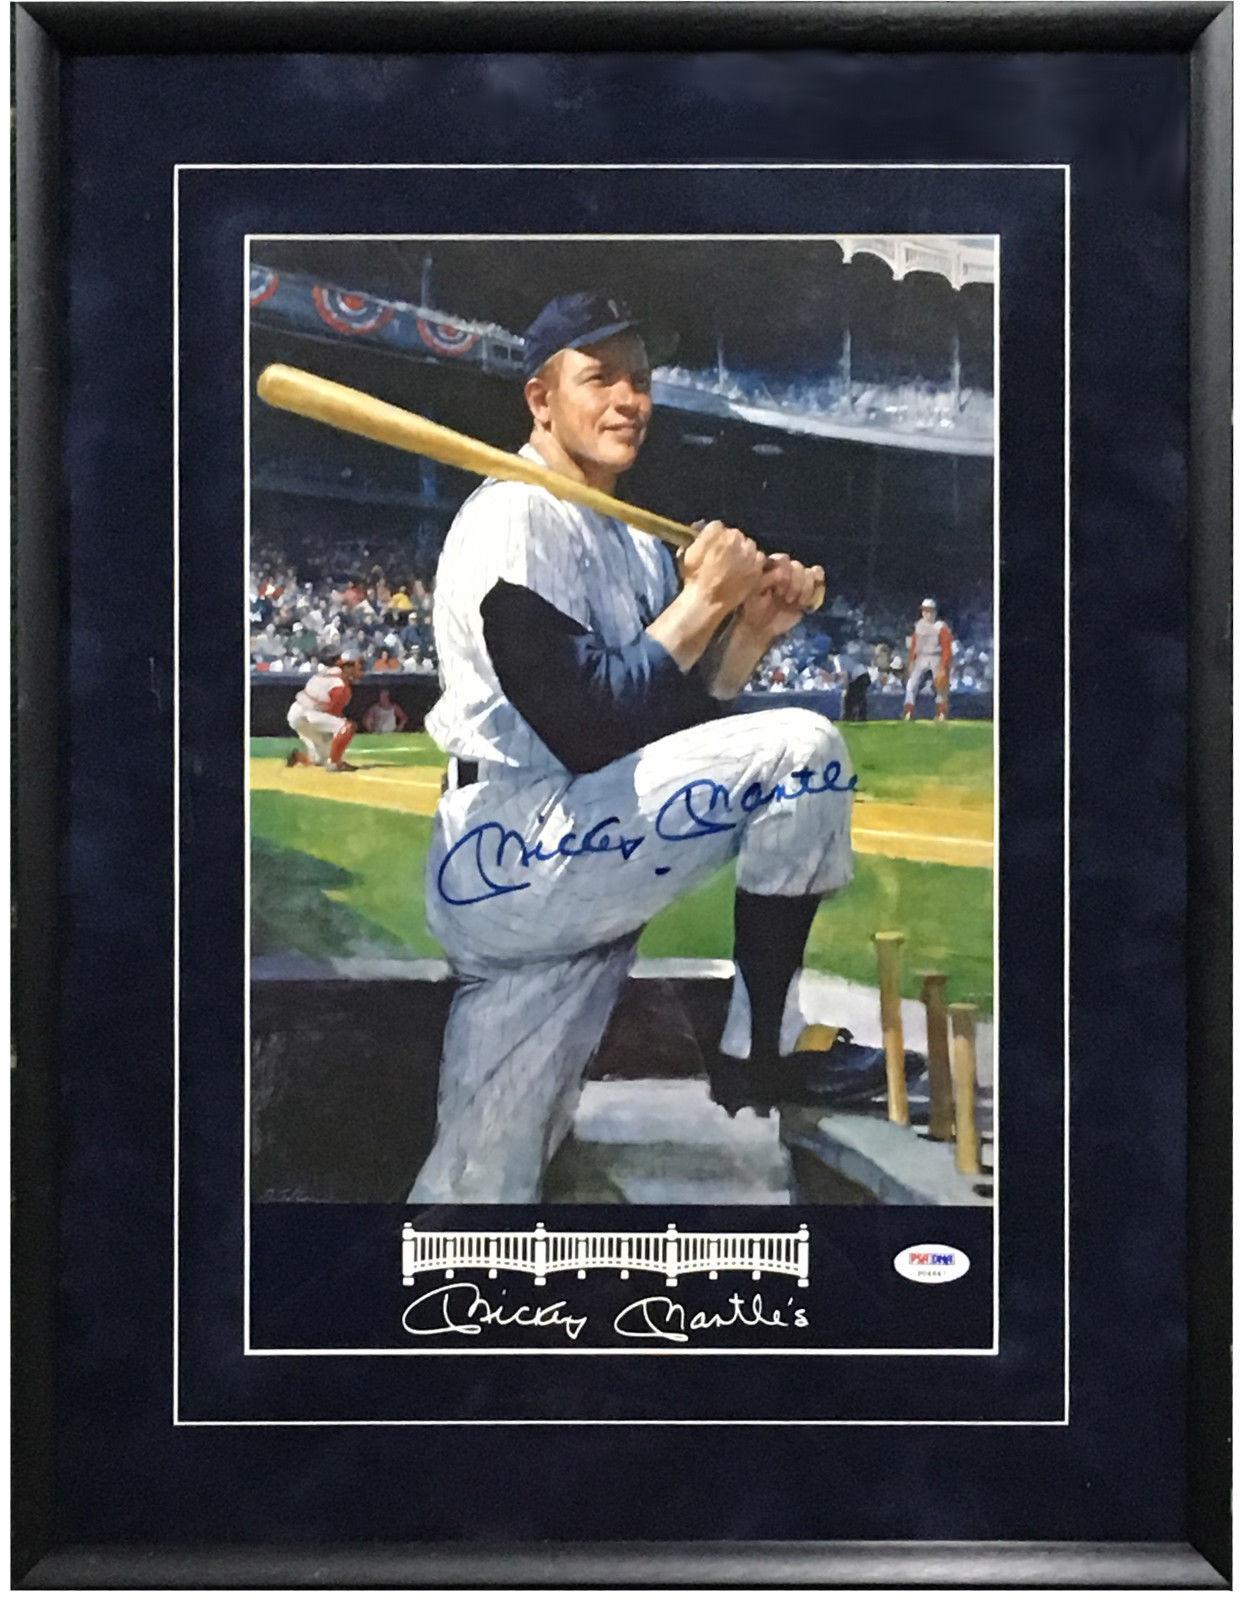 Mickey Mantle Yankees Signed restaurant menu framed autograph PSA/DNA LOA